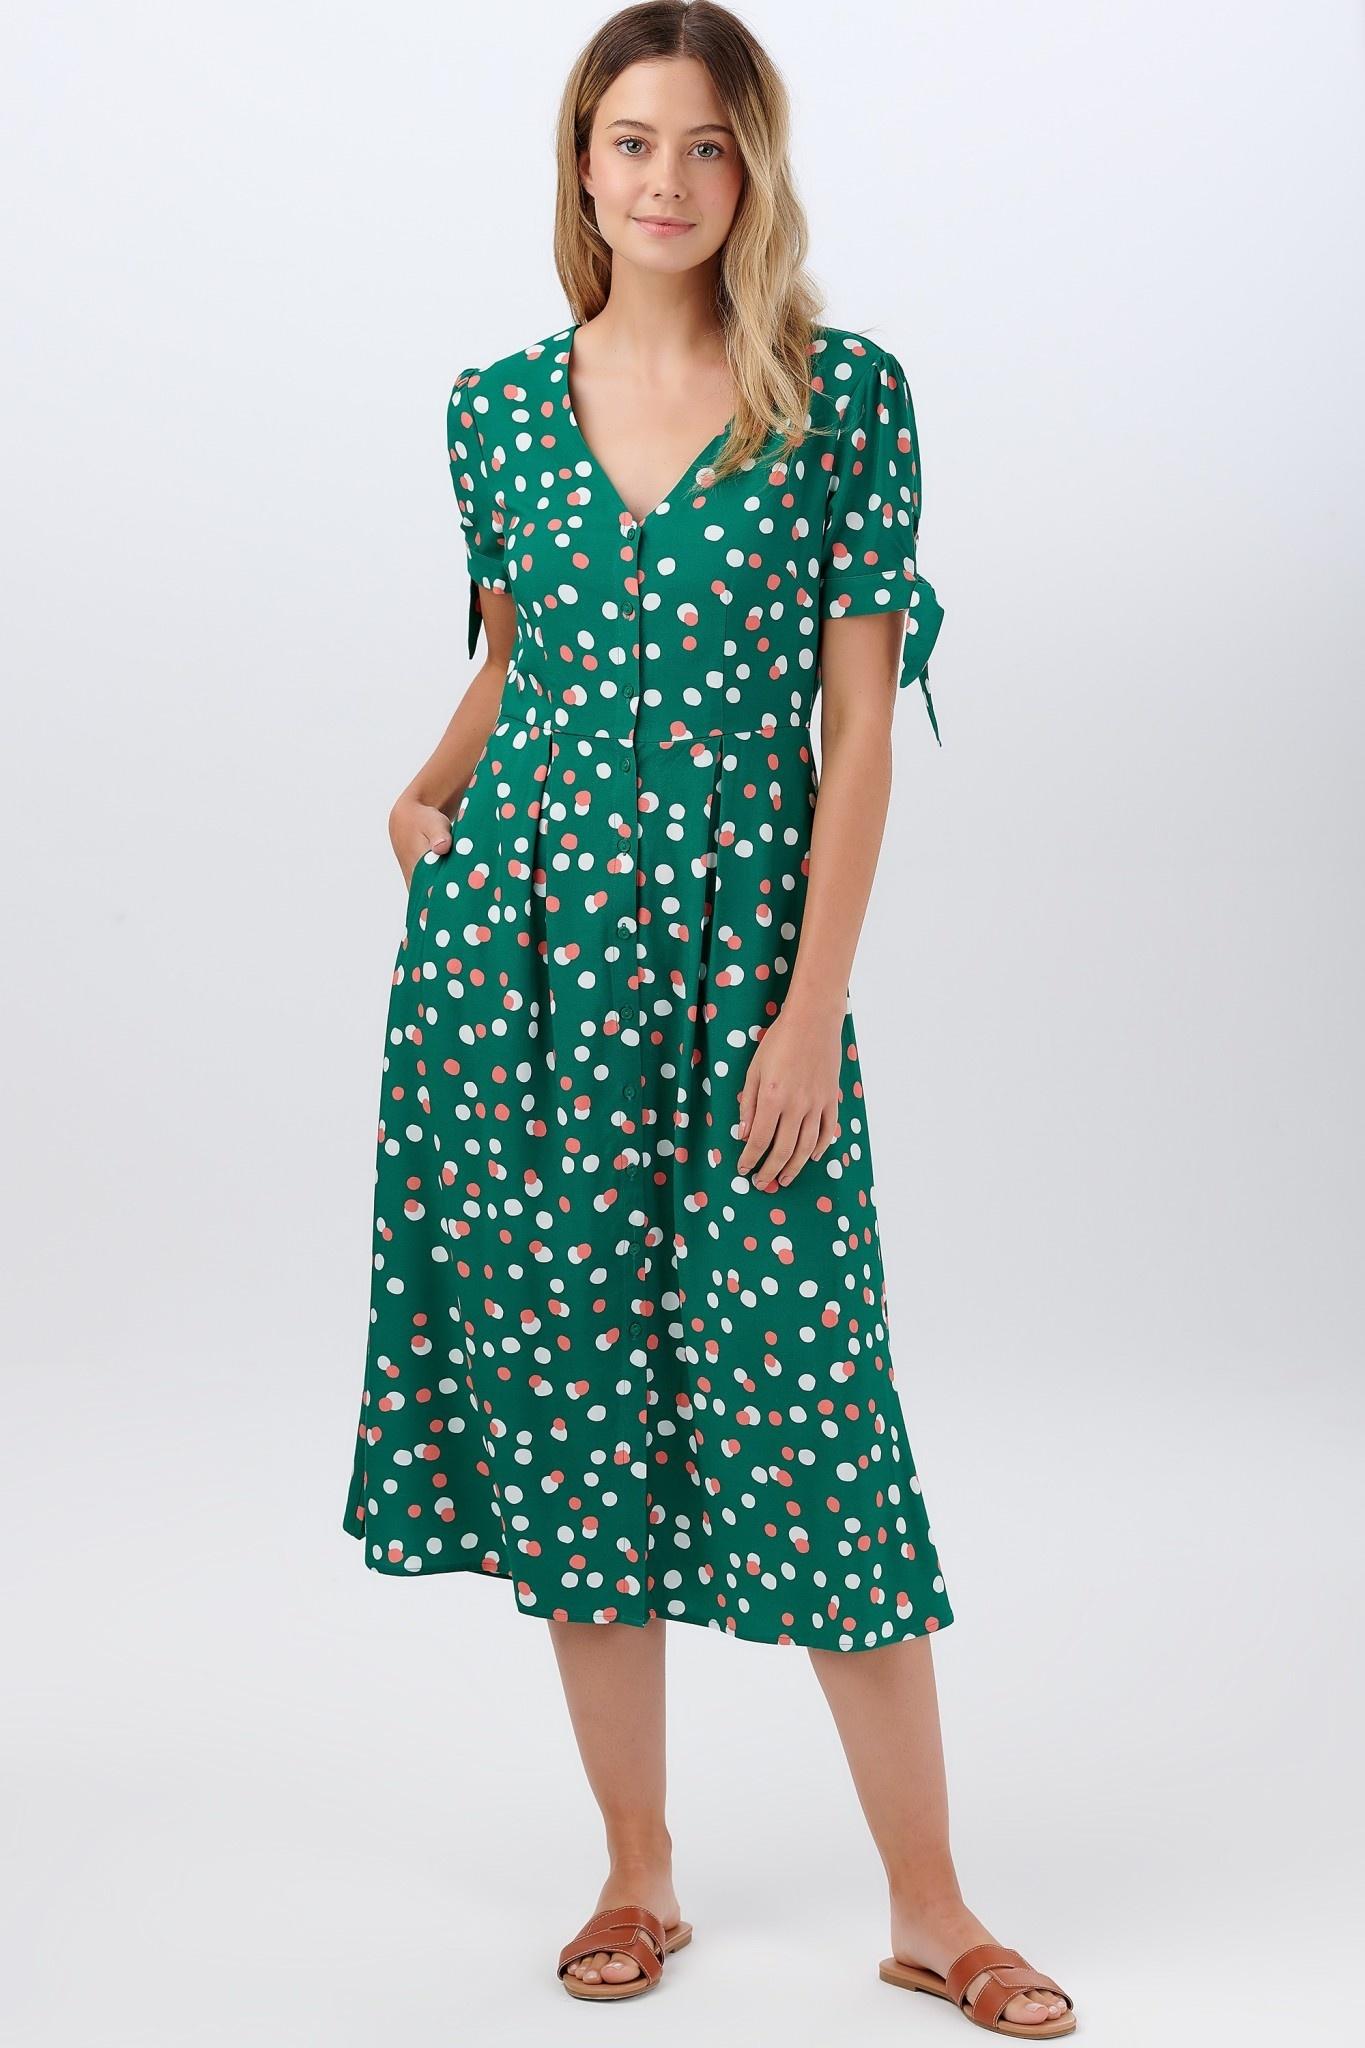 Veronica tea dress Green Dots-1